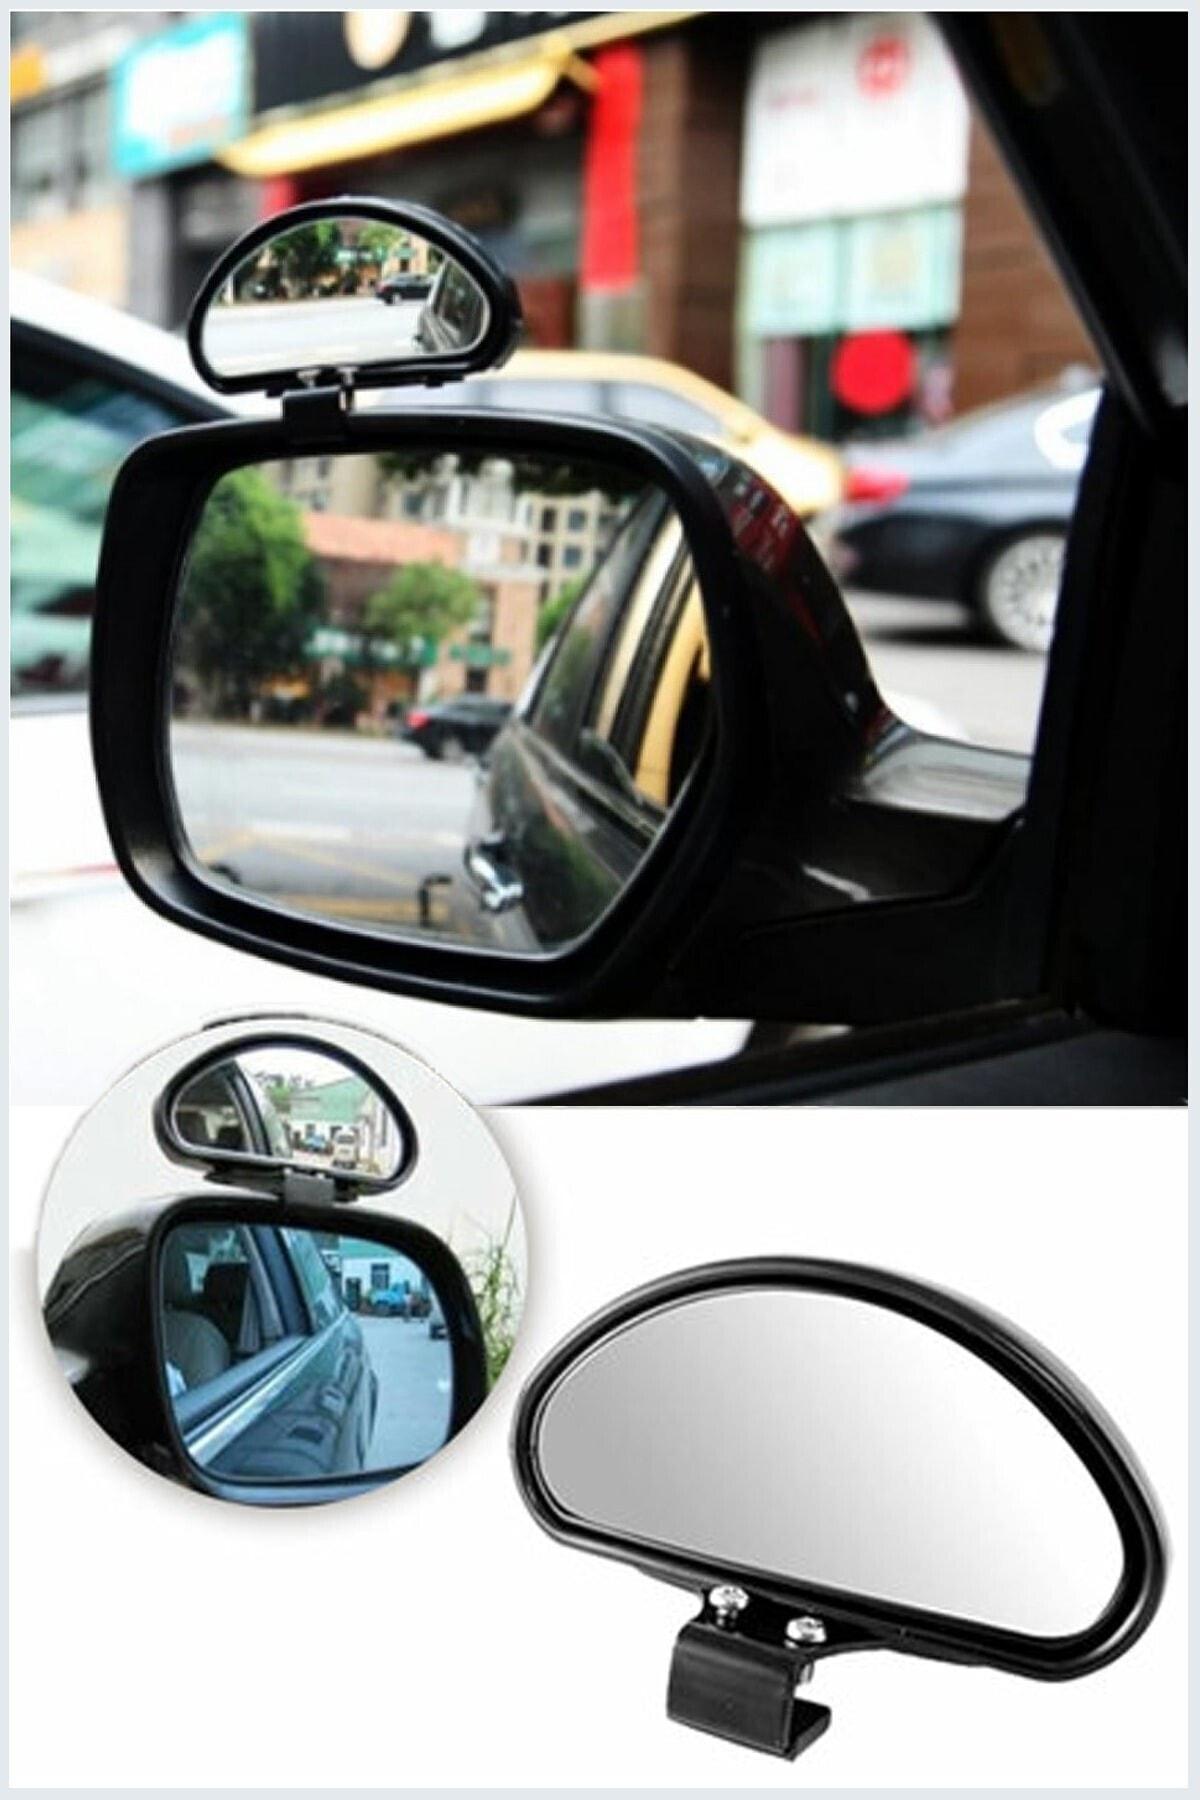 Araba Dış Ayna Üstü Ilave Kör Nokta Aynası (1 Adet)